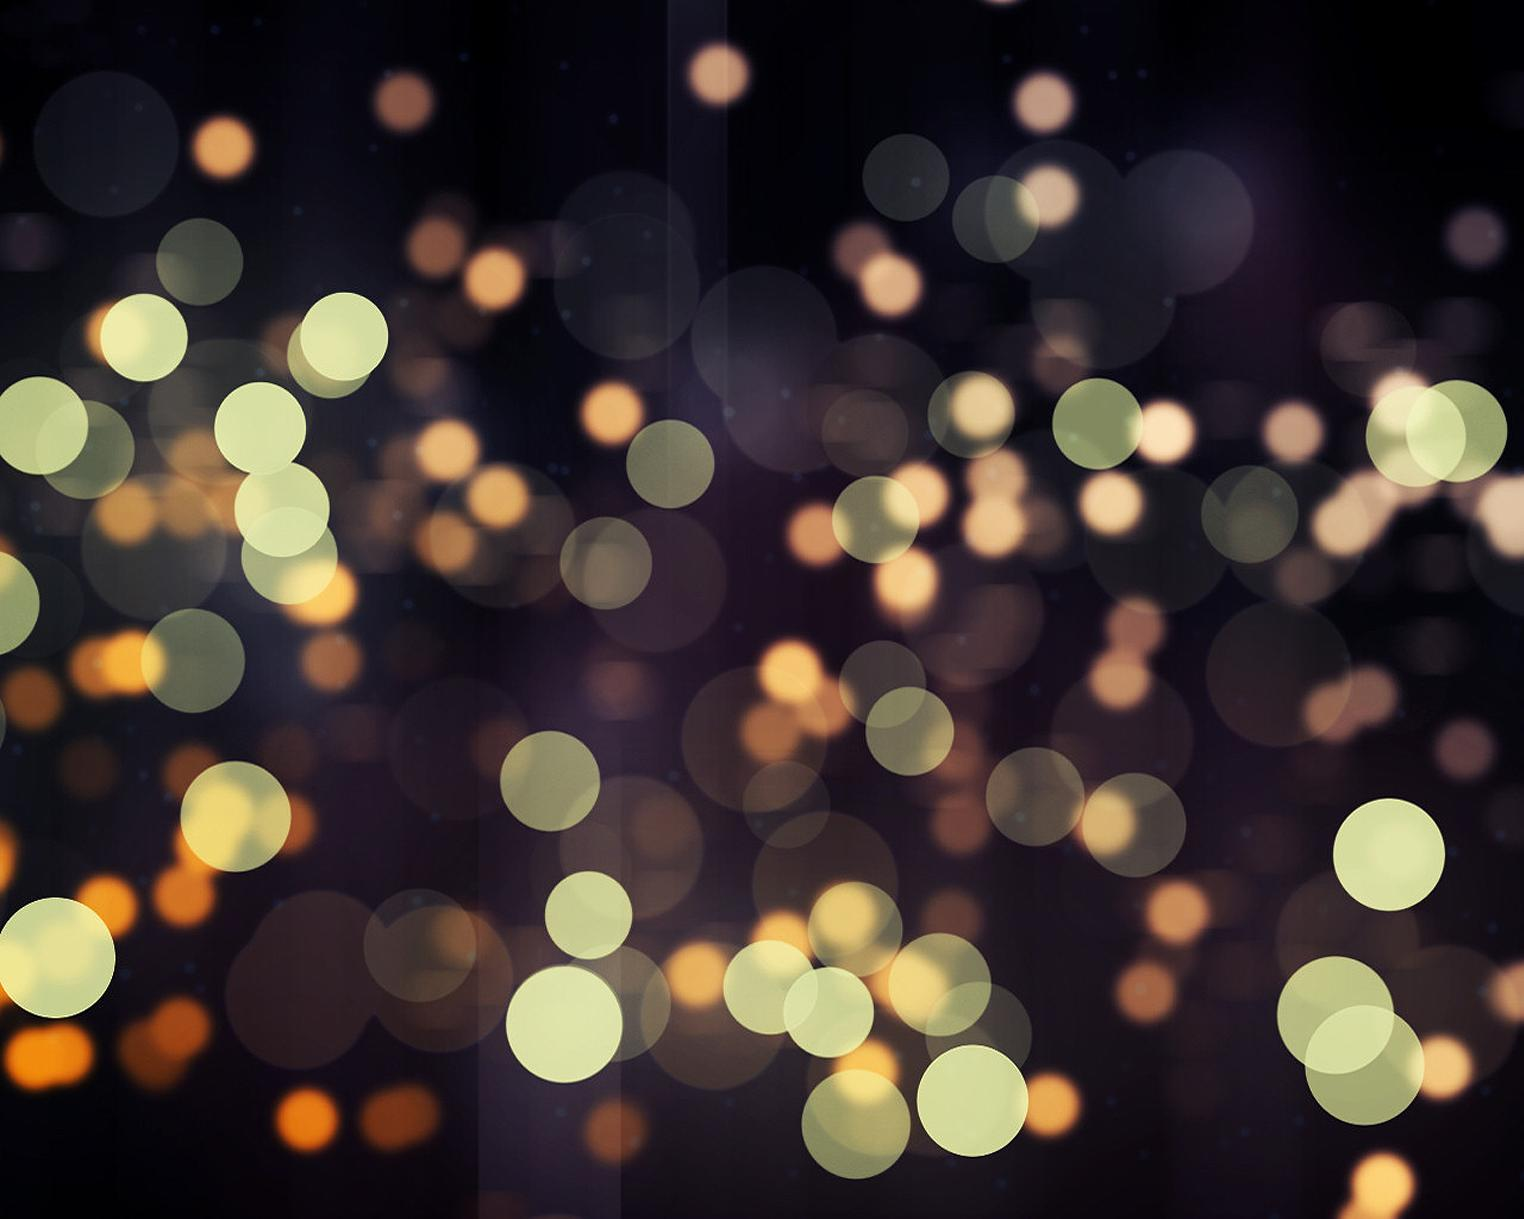 Lights Backgrounds on Wallpapers Vista